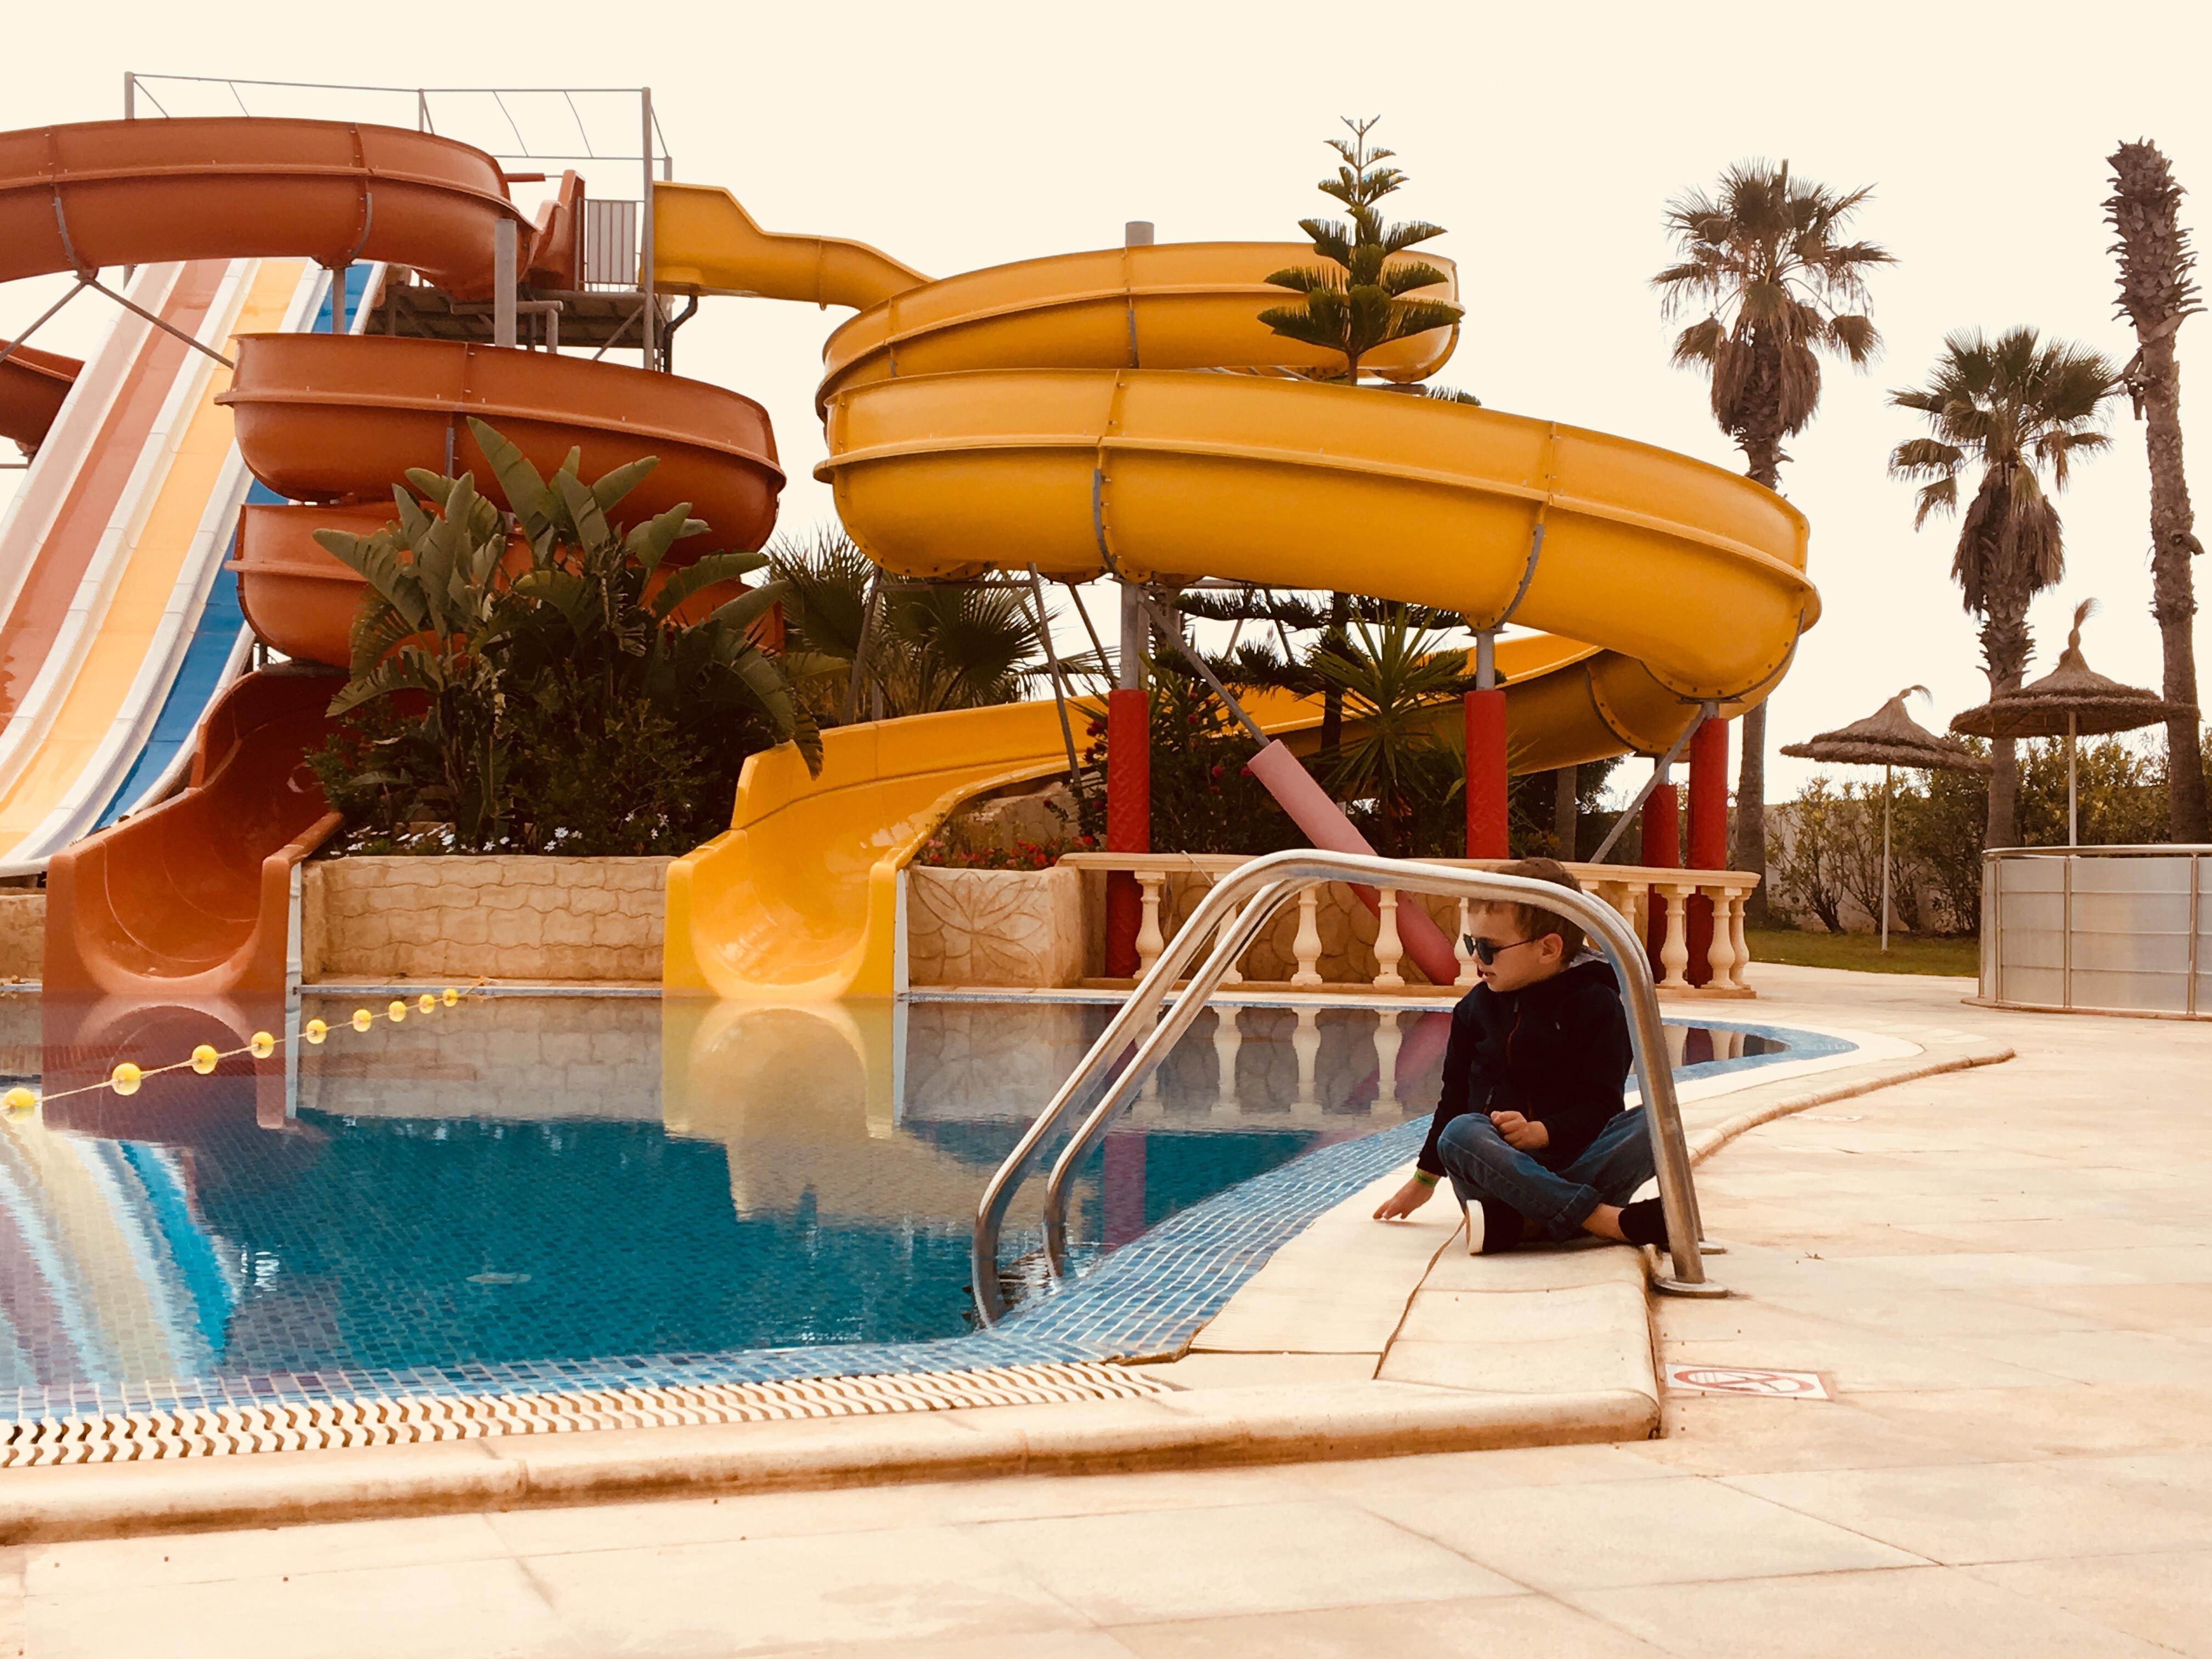 Une semaine au club magic life africana le blog de flexyflow for Club piscine soleil chicoutimi